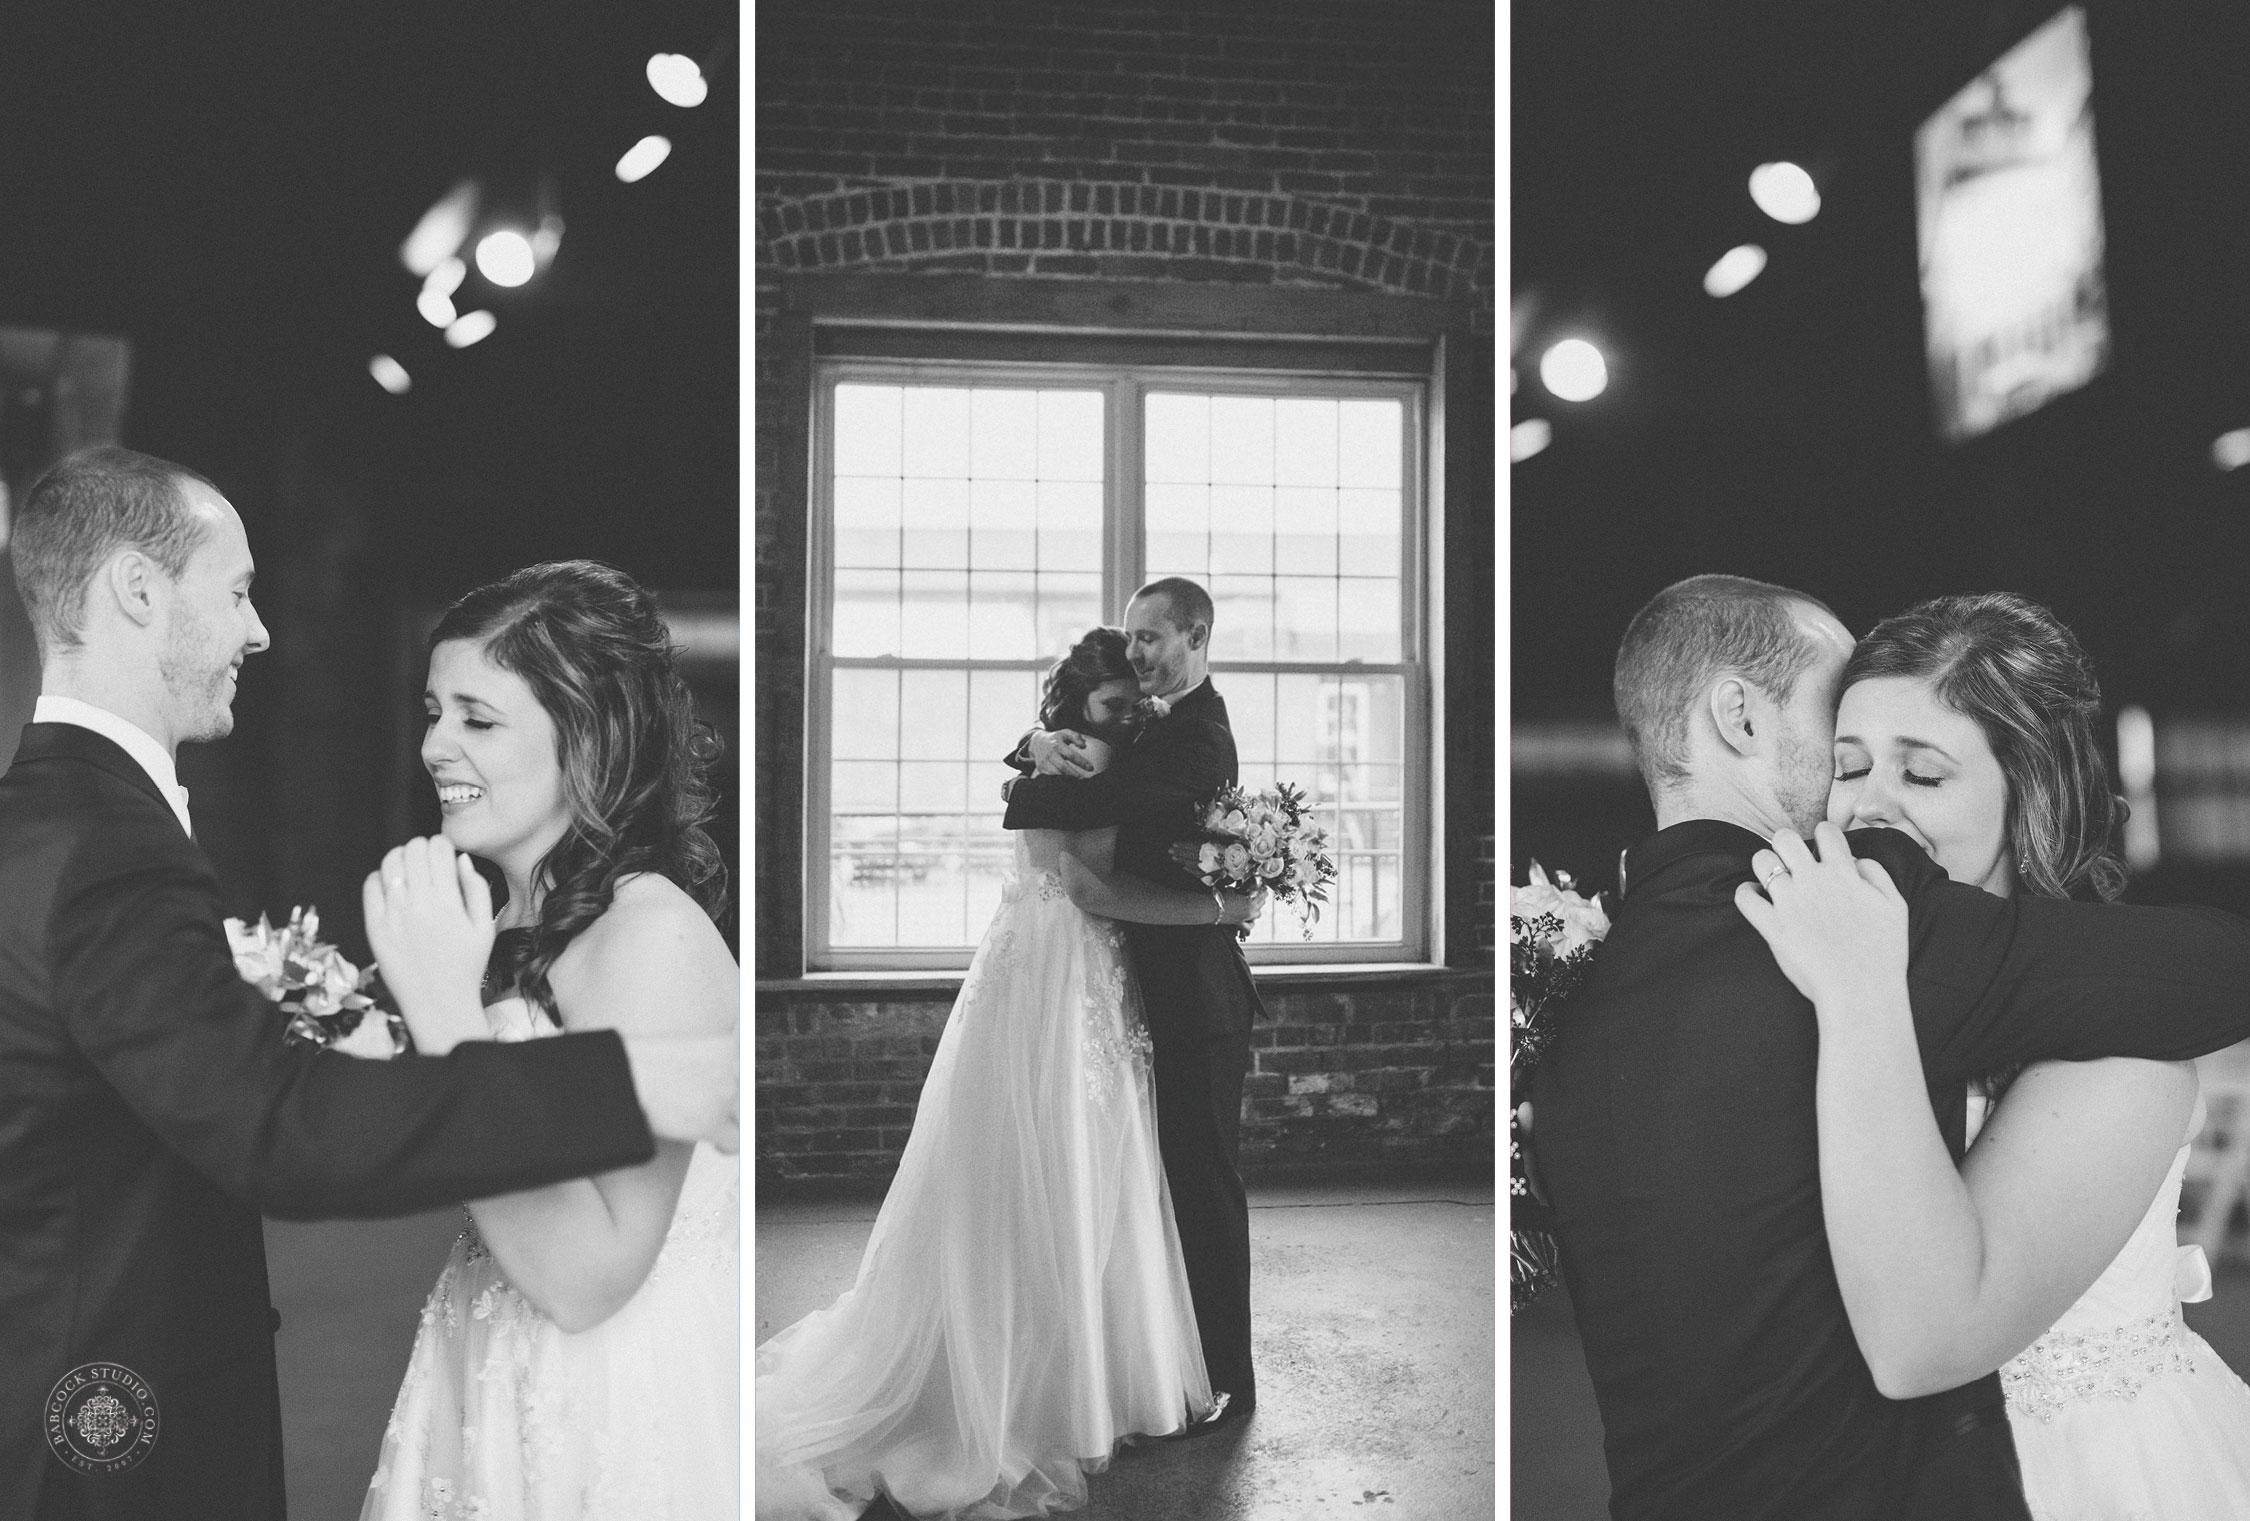 erica-nick-wedding-photographer-dayton-ohio-3.jpg